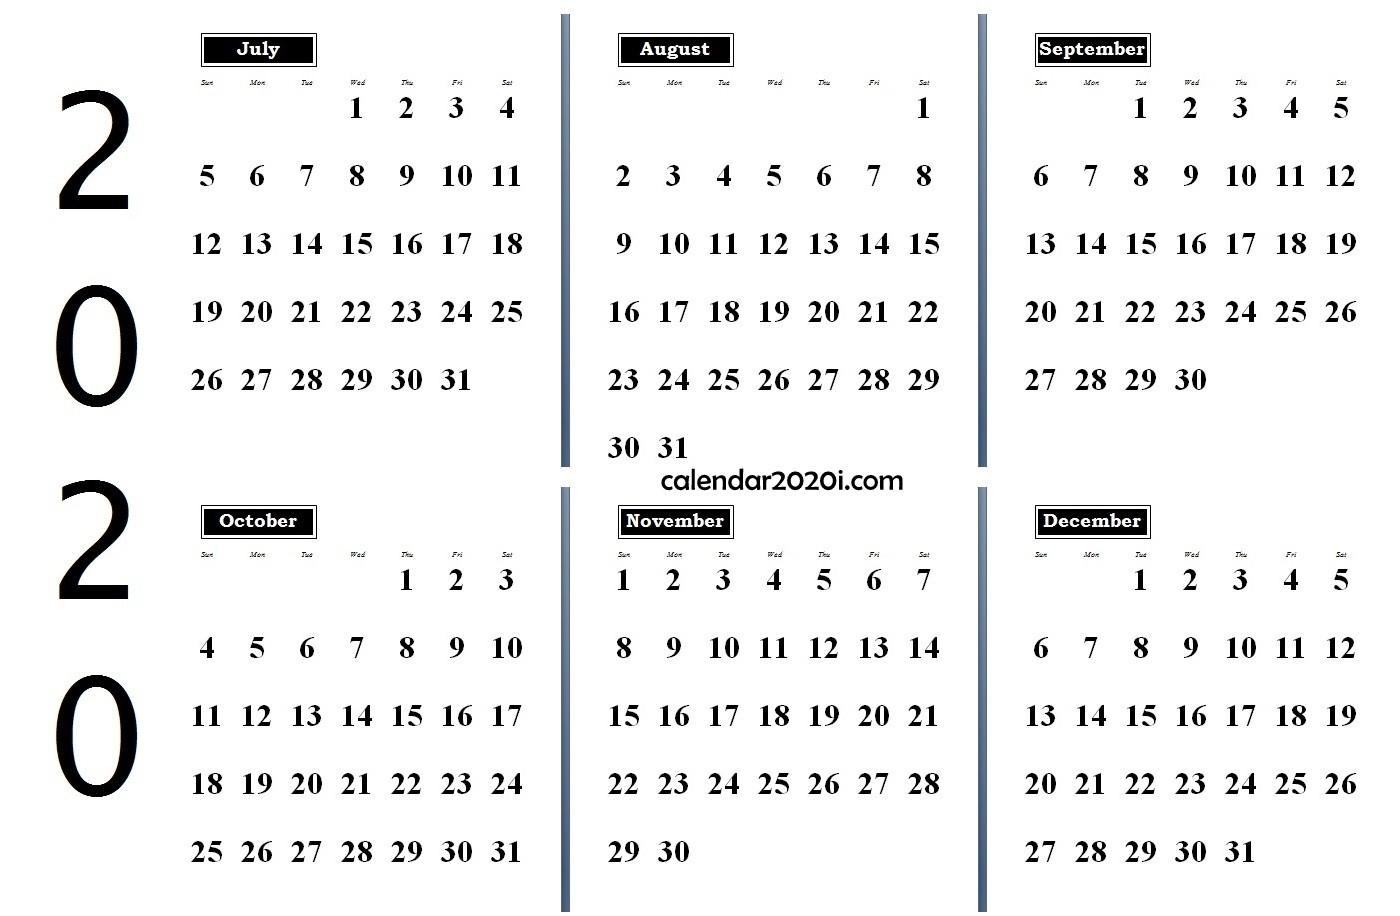 6 Months 2020 Half Year Printable Calendar | Calendar 2020-Blank 3 Month Calendar 2020 Printable